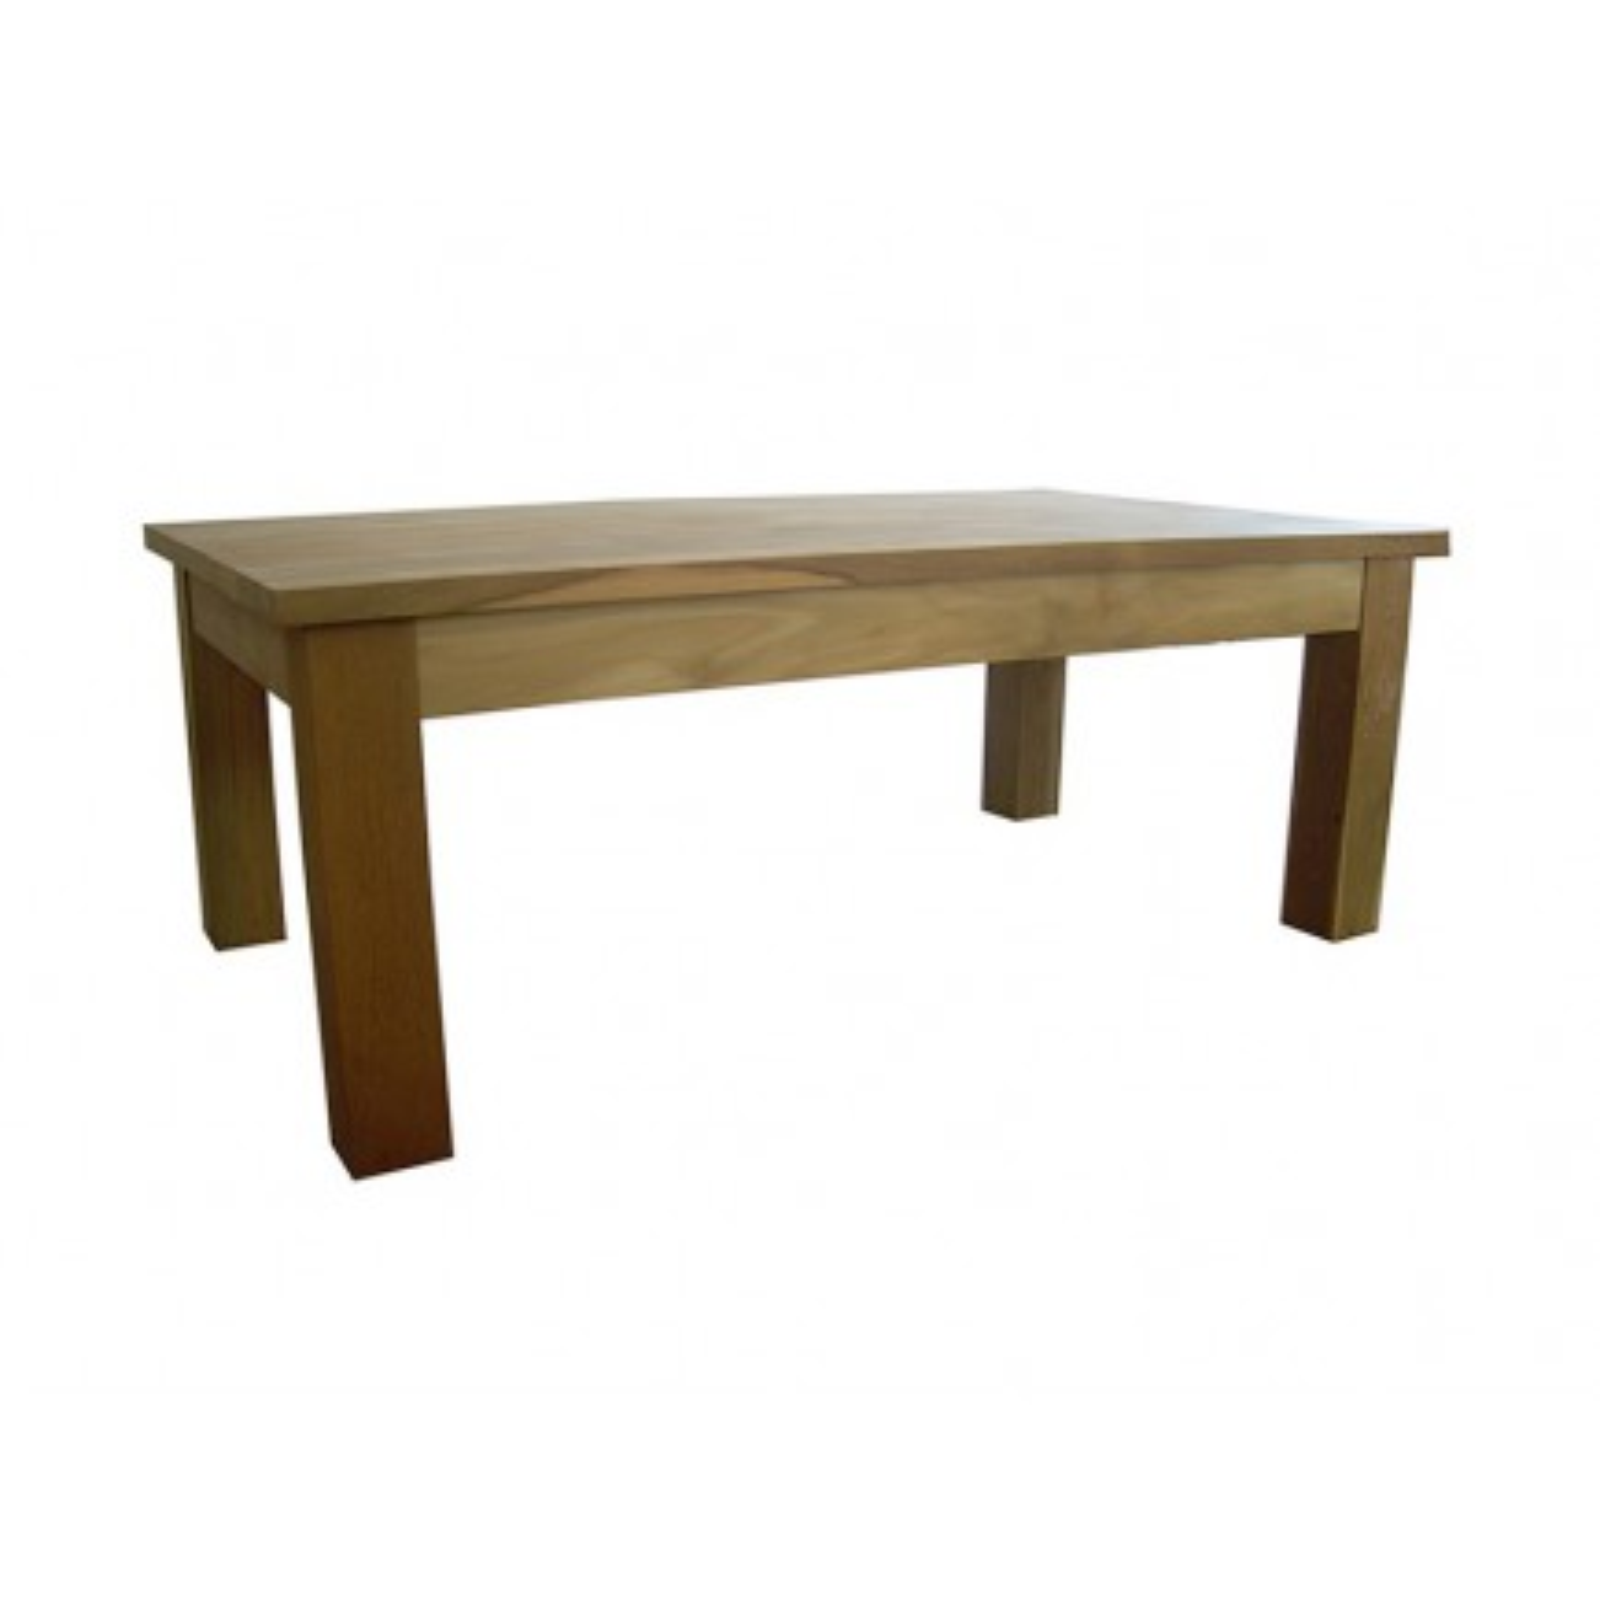 Table Basse Rectangulaire Greenface Teck Recyclé - meuble style exotique